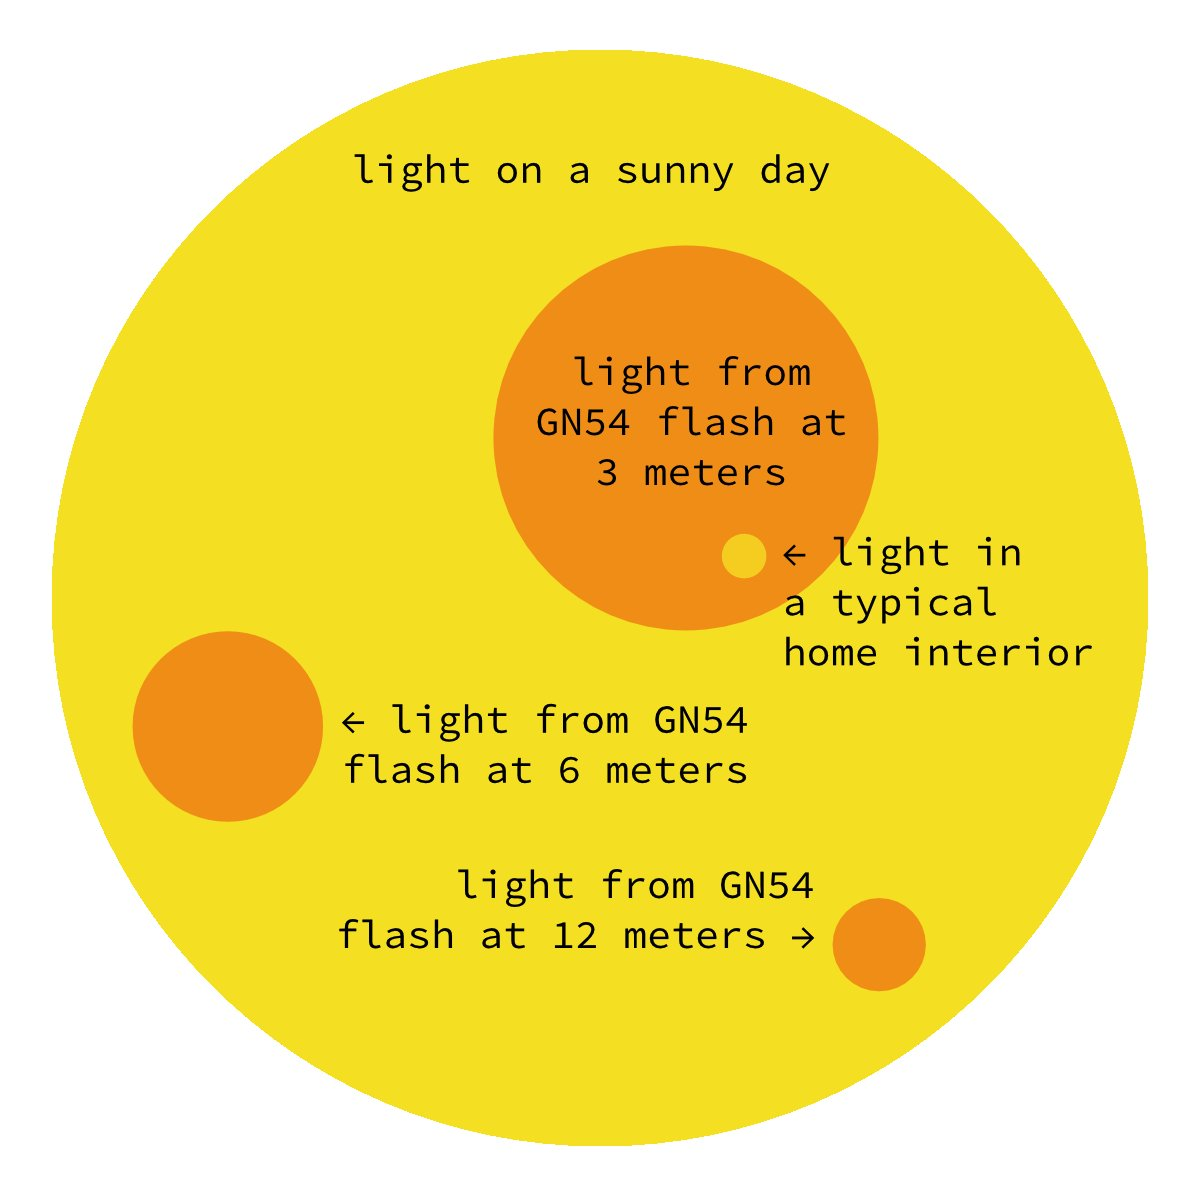 relative light